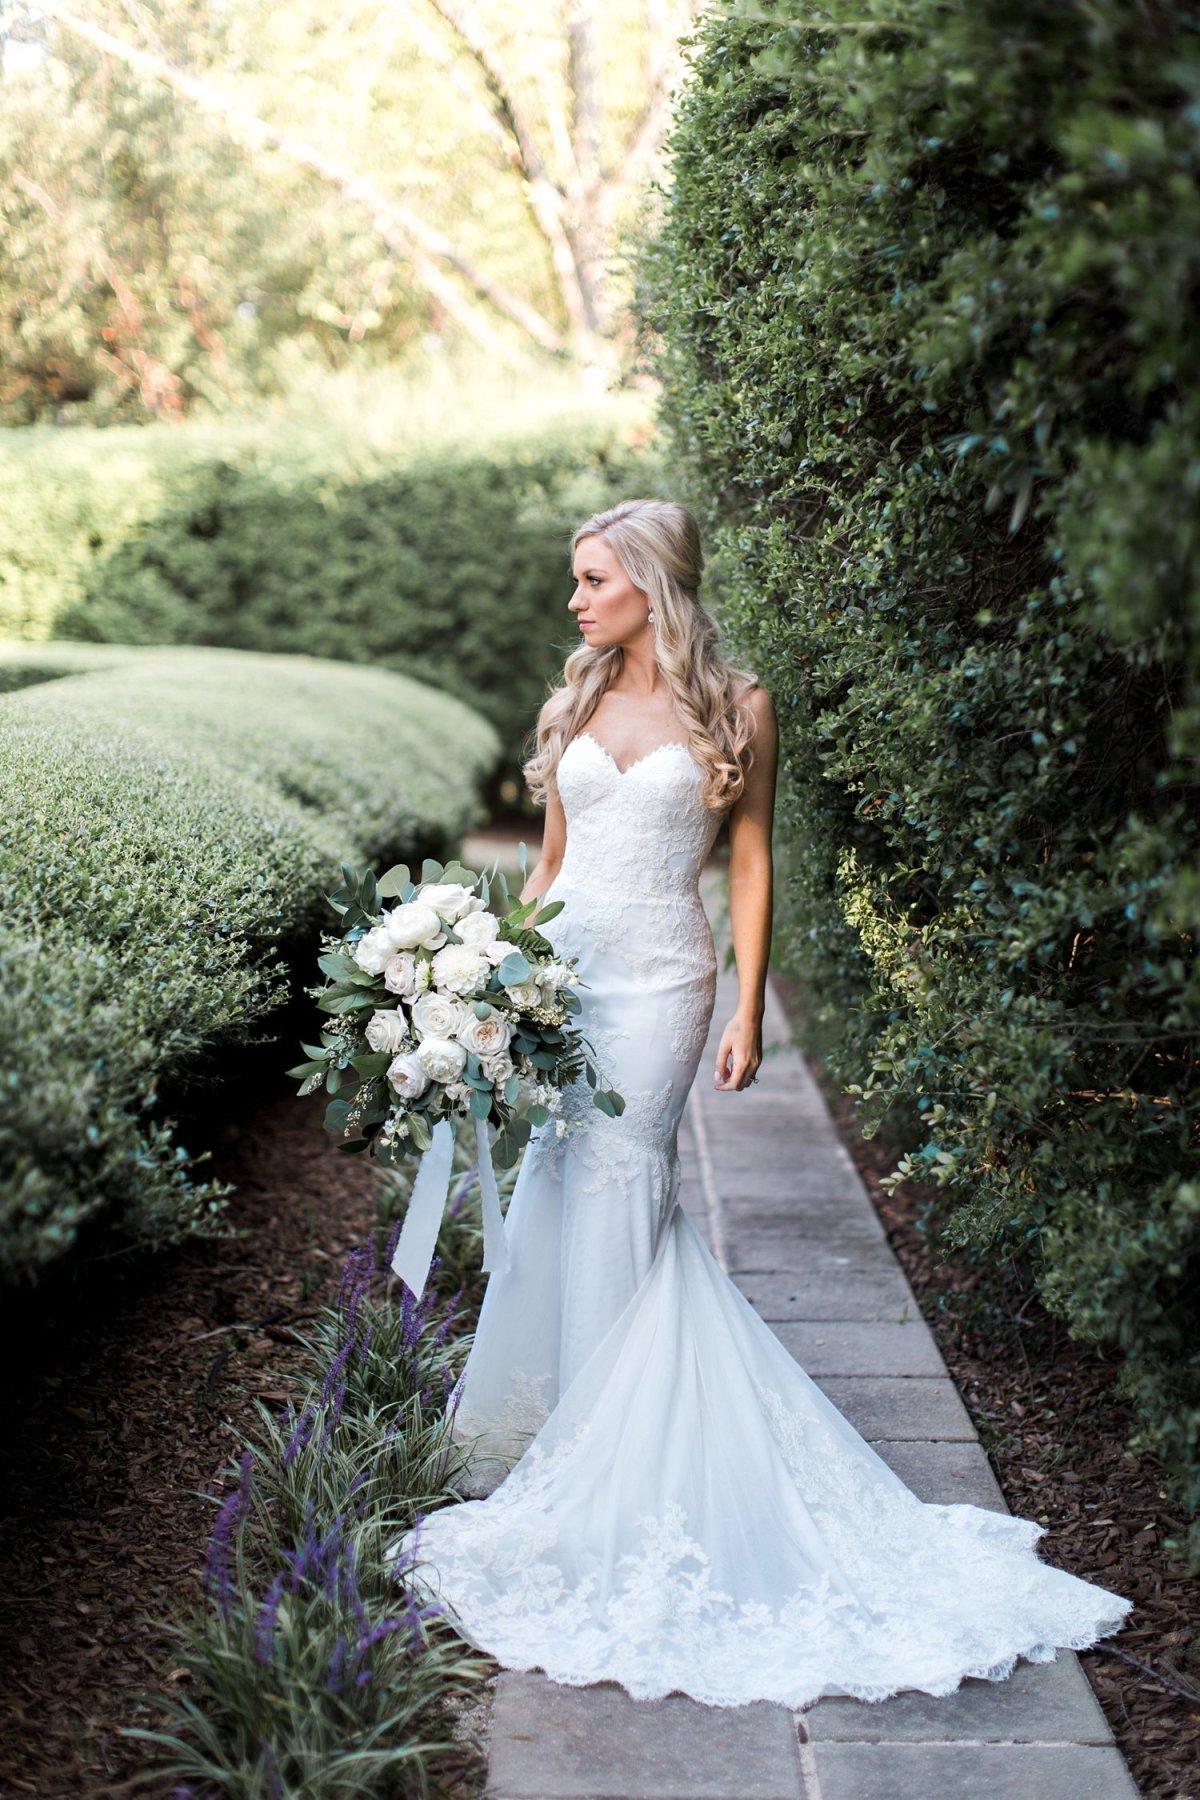 dallas-bridal-wedding-portrait-photographer-aldredge-house-emily-1.jpg